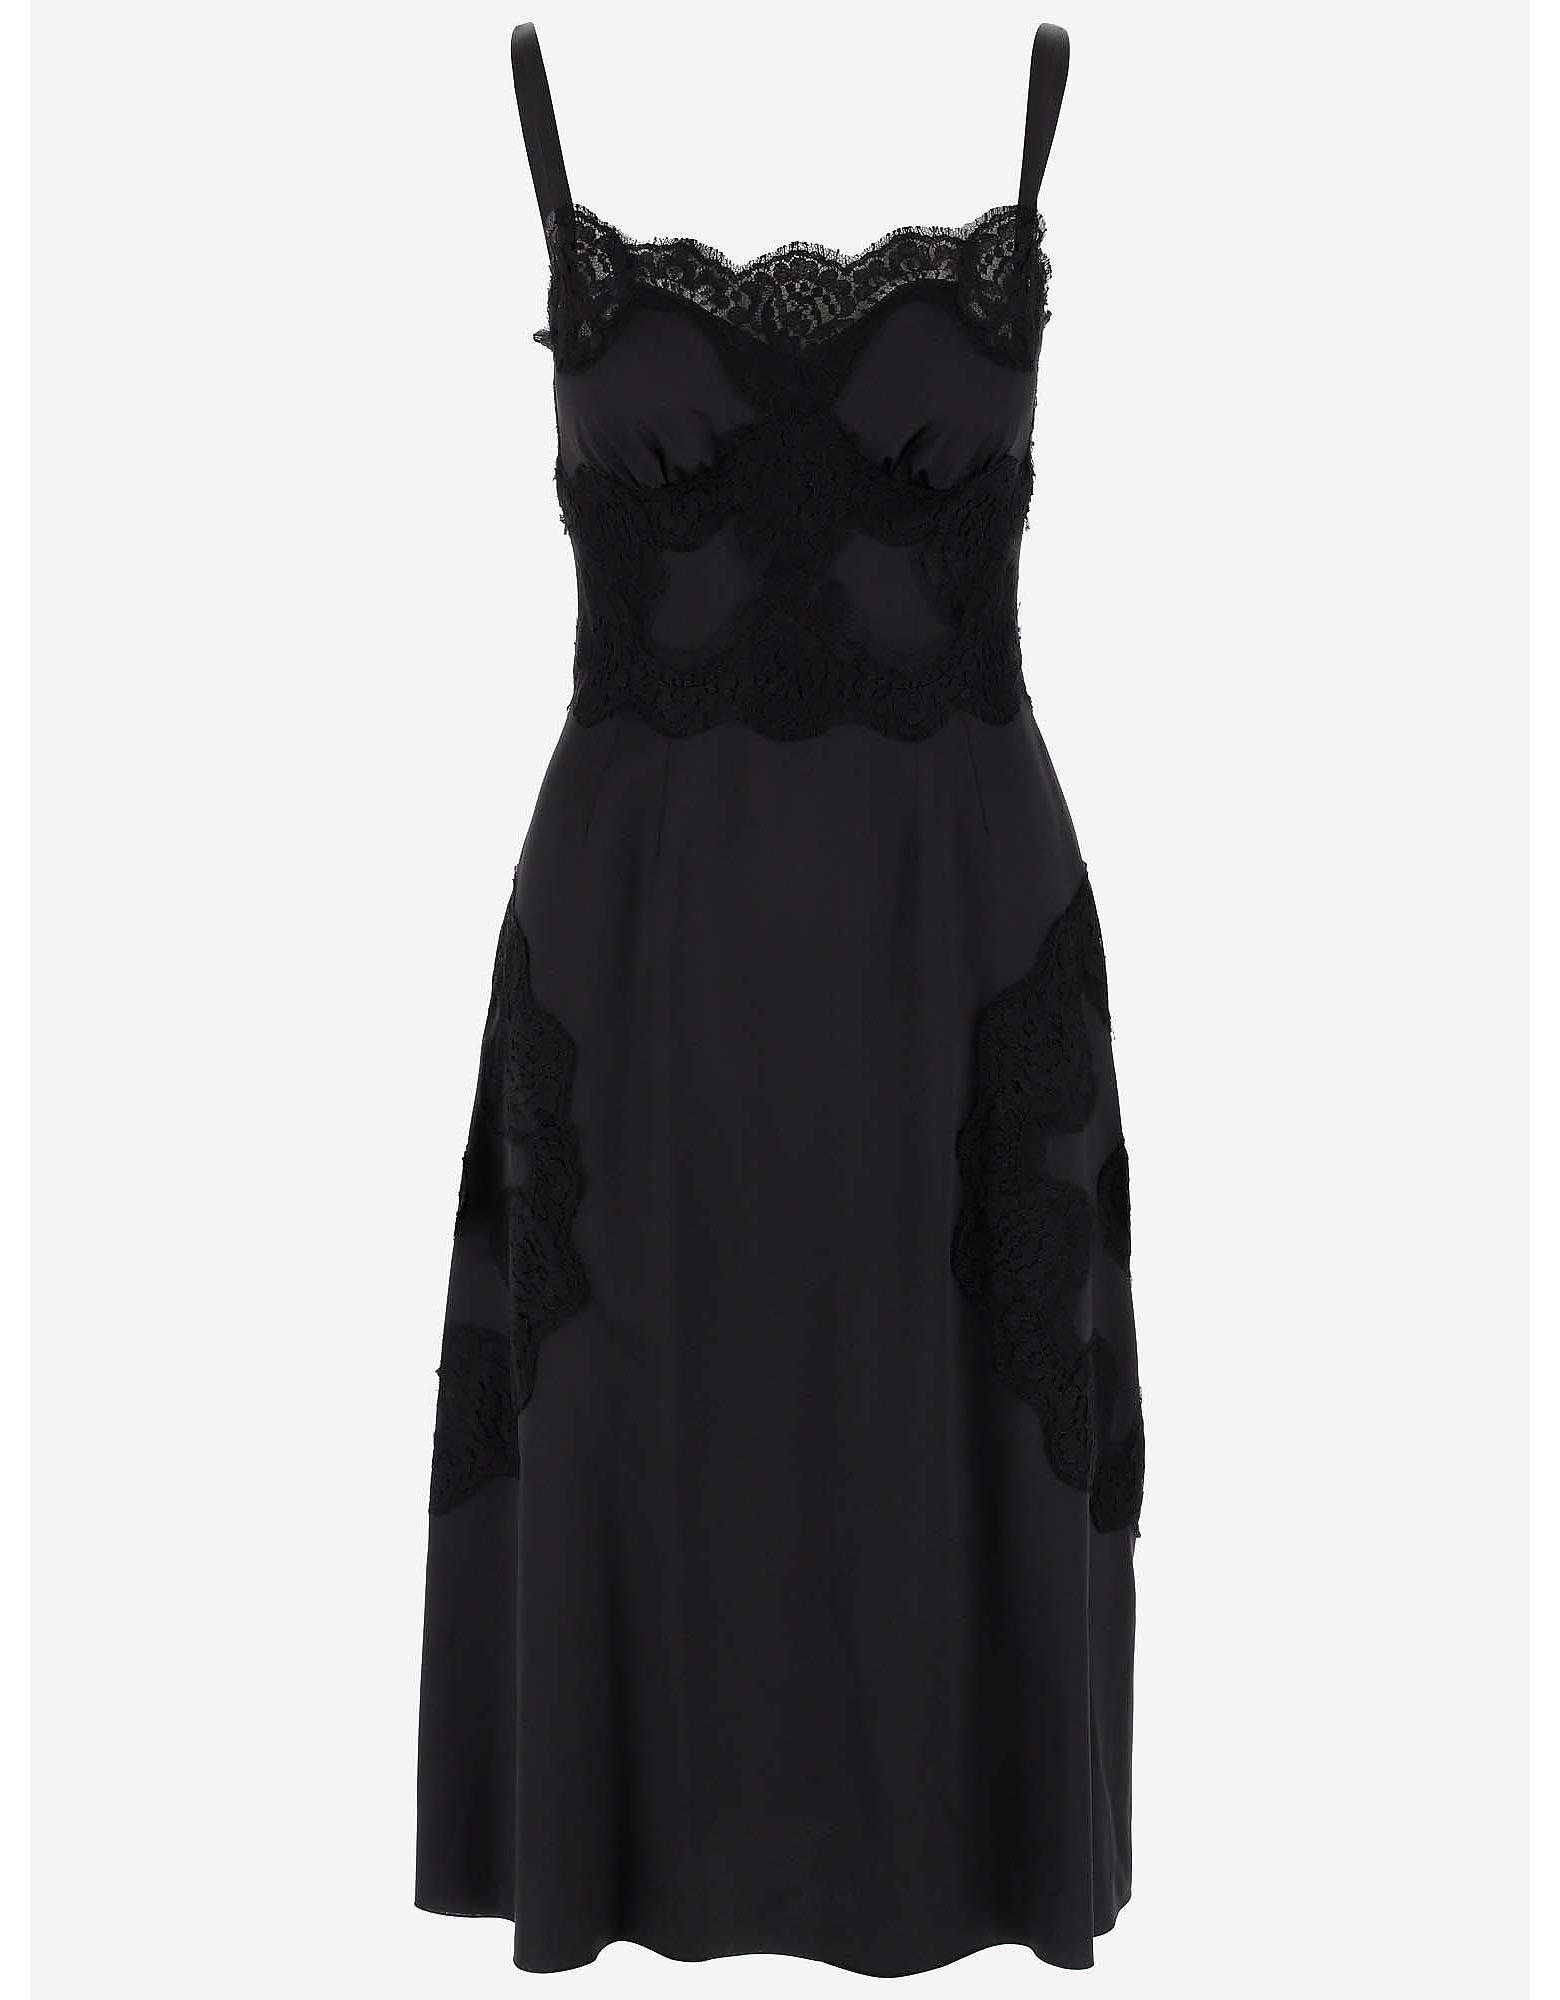 Dolce & Gabbana Designer Dresses & Jumpsuits, Lace Edge Satin Silk Women's Dress